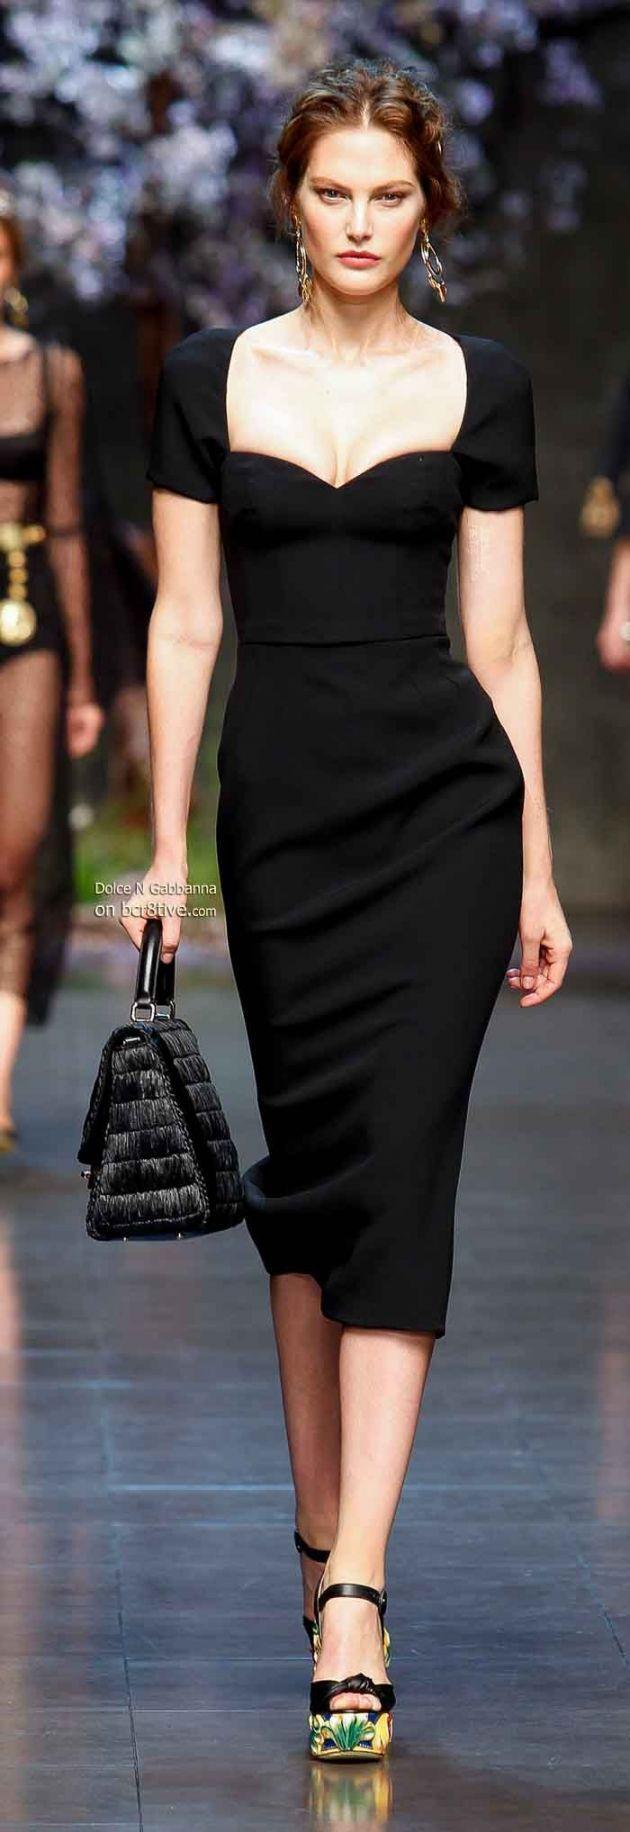 Fashion Mia Online Customer Reviews: Fashion, Dresses, Style